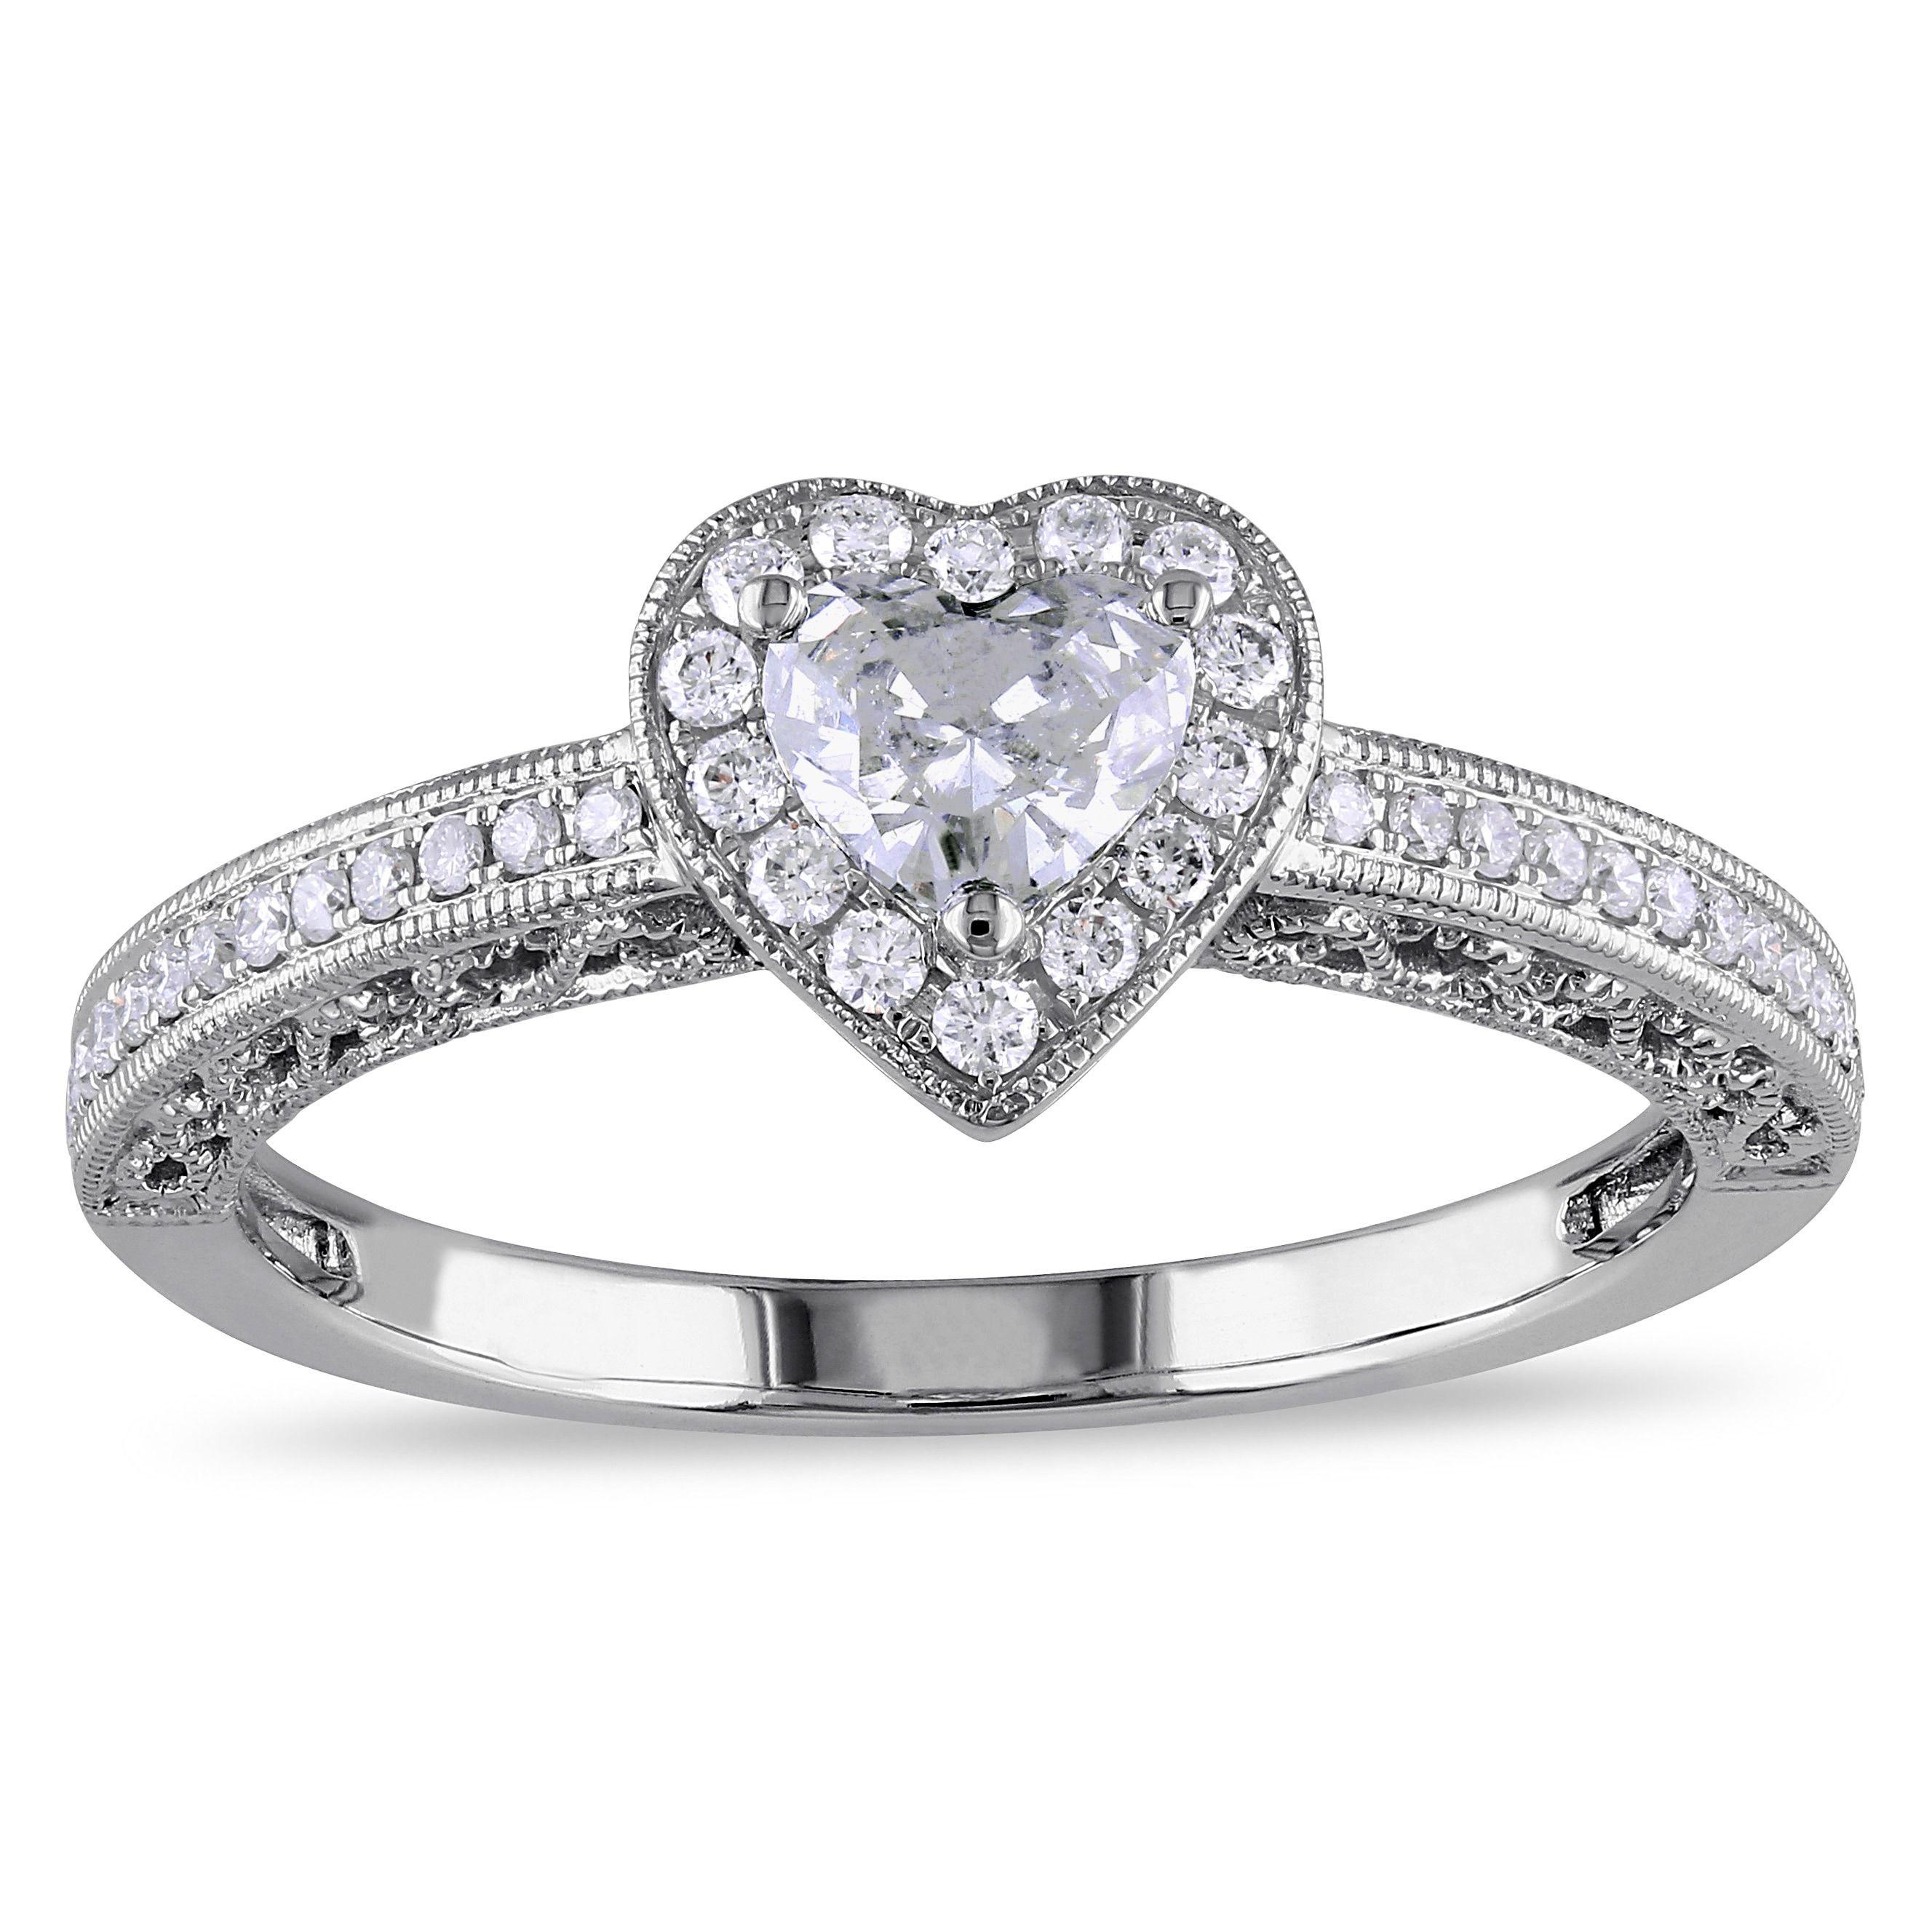 Miadora signature collection 14k white gold 1ct tdw diamond double row - Miadora Signature Collection 14k White Gold 1 2ct Tdw Diamond Heart Ring G H I1 I2 Size 10 Women S